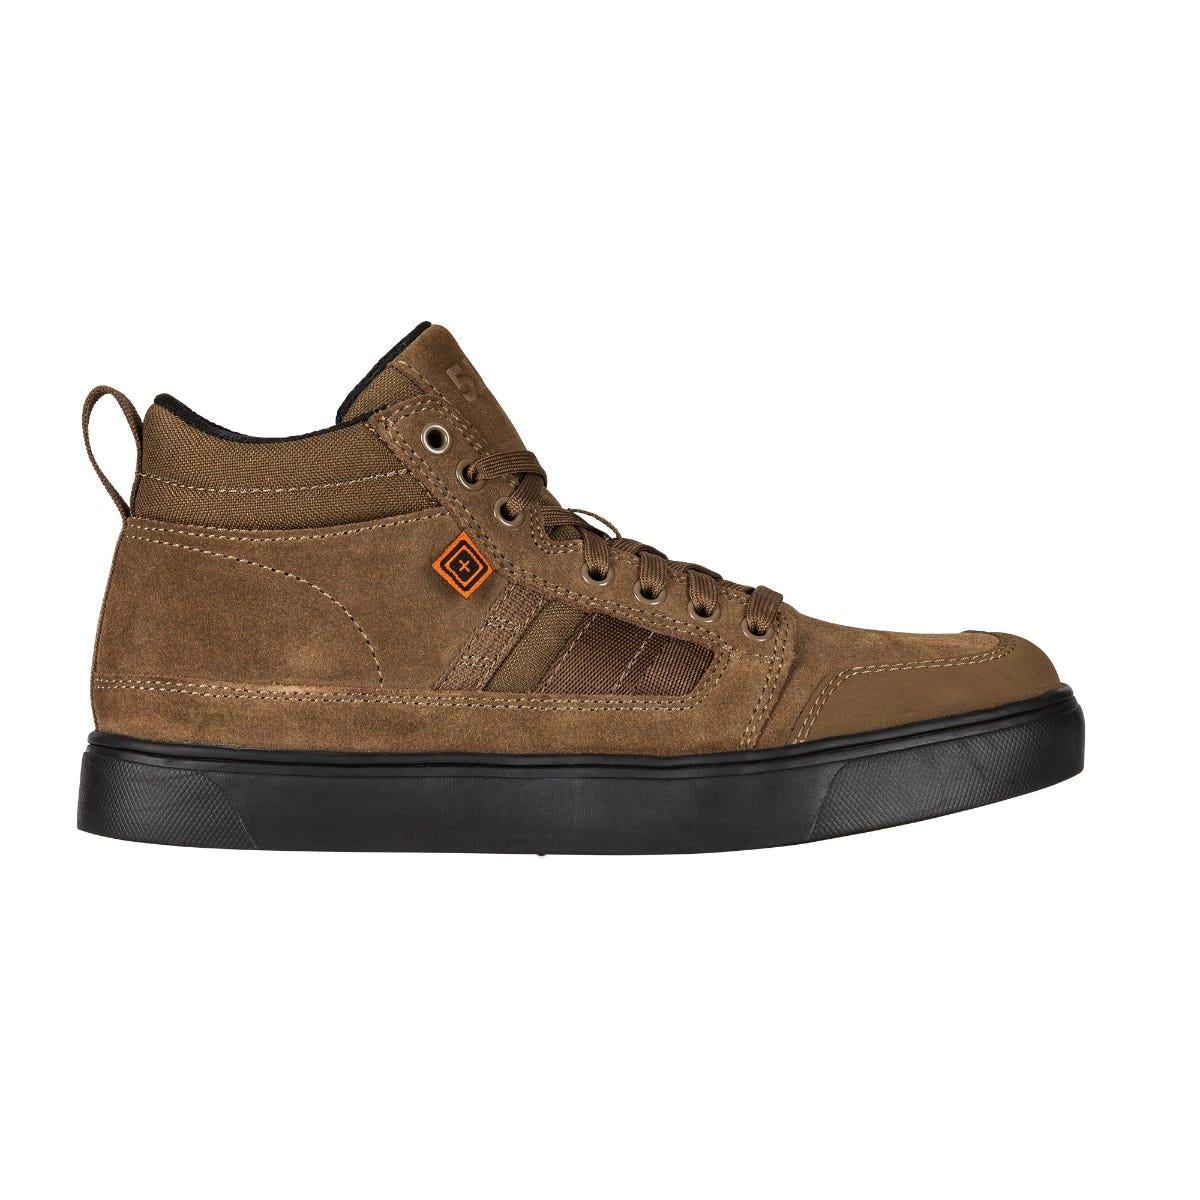 Norris Sneaker - New Color - 5.11 Tactical